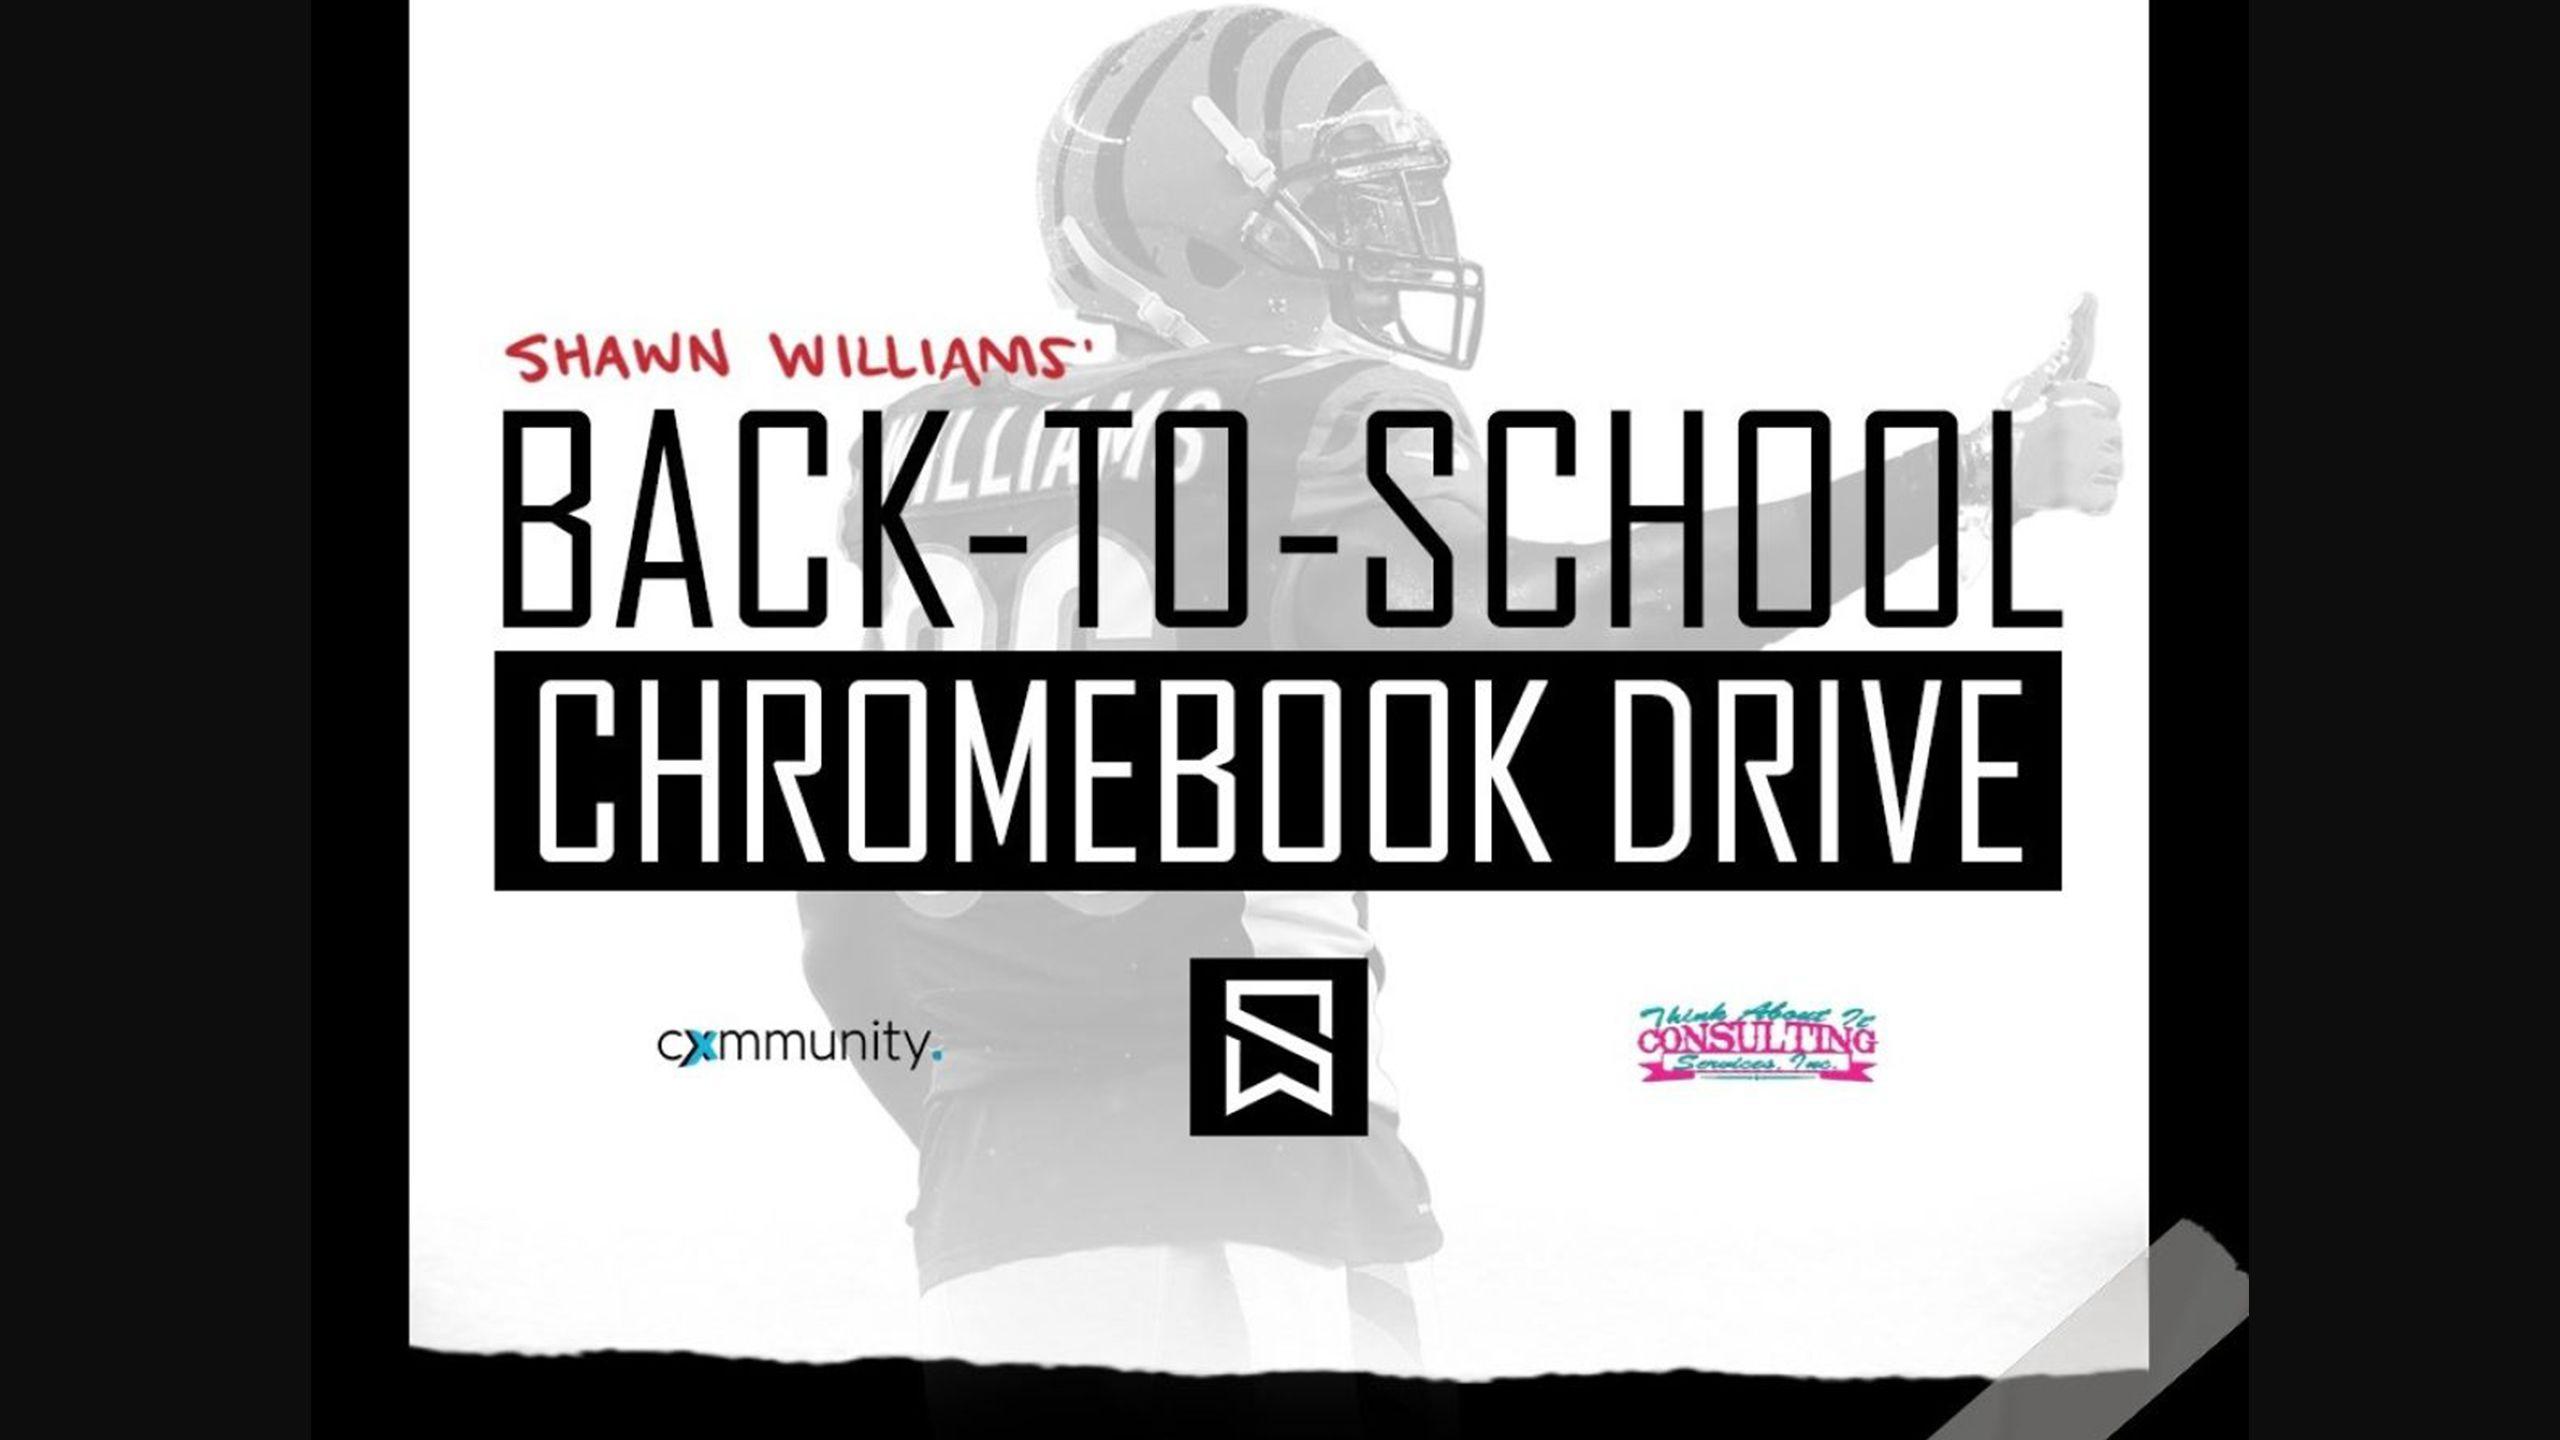 Shawn Williams' Back-to-School Chromebook Drive